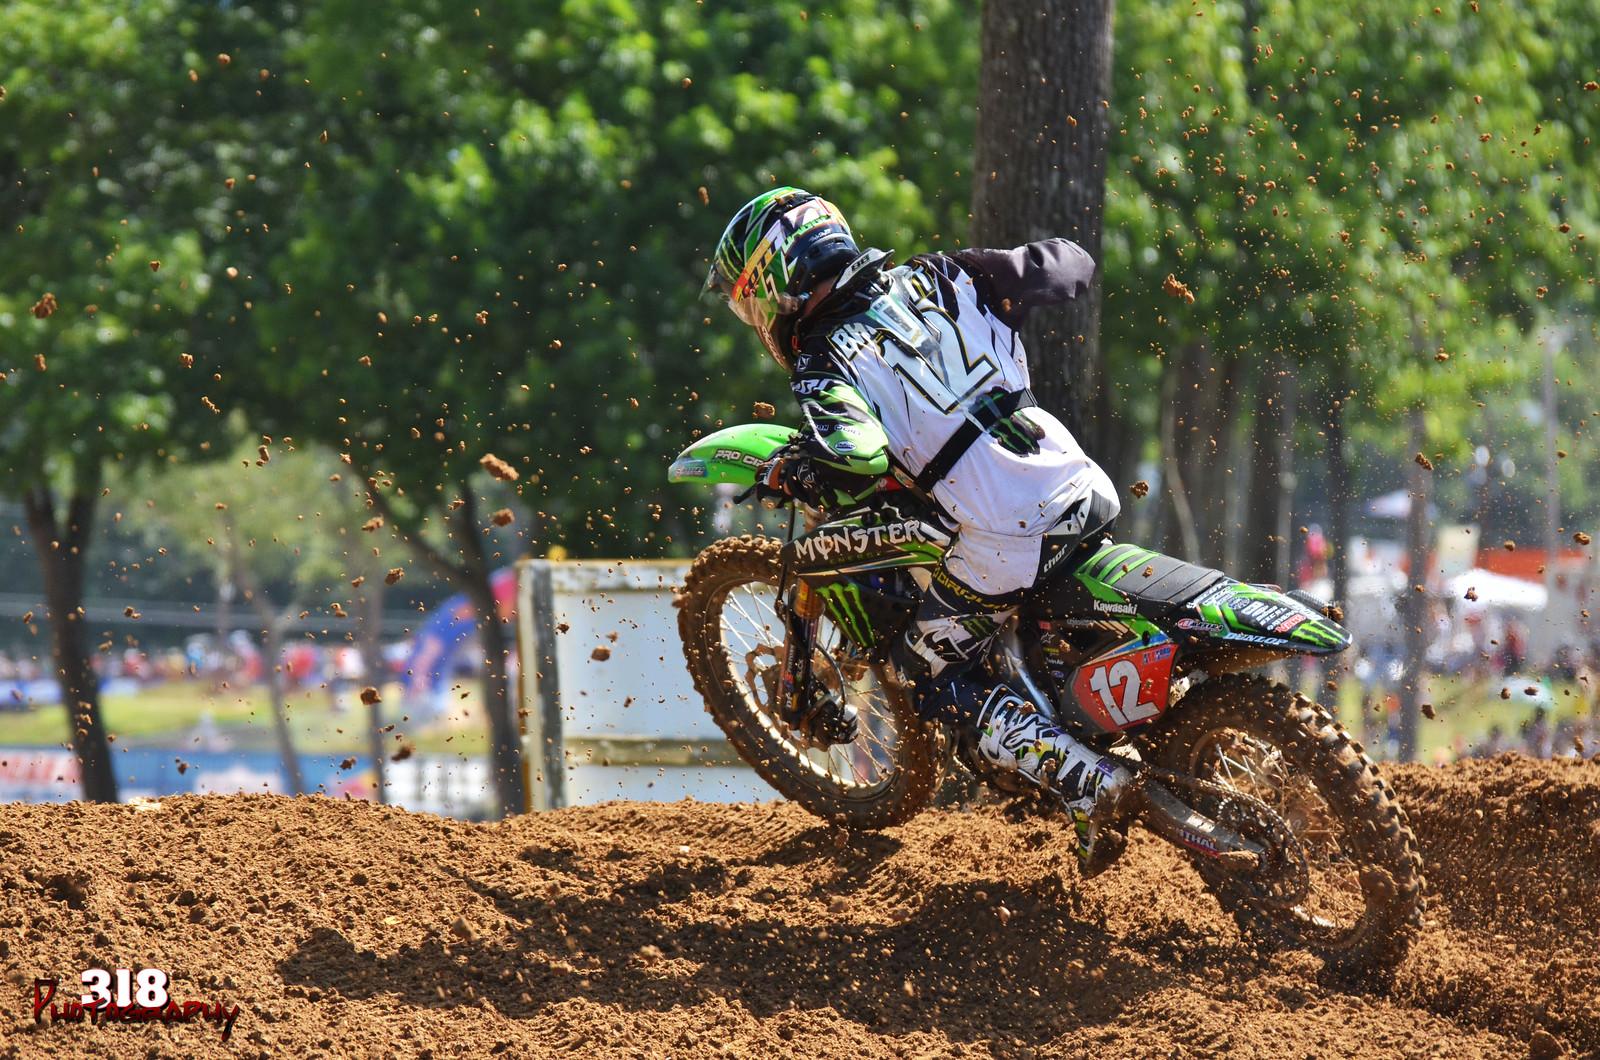 12-01 - MxPro318 - Motocross Pictures - Vital MX